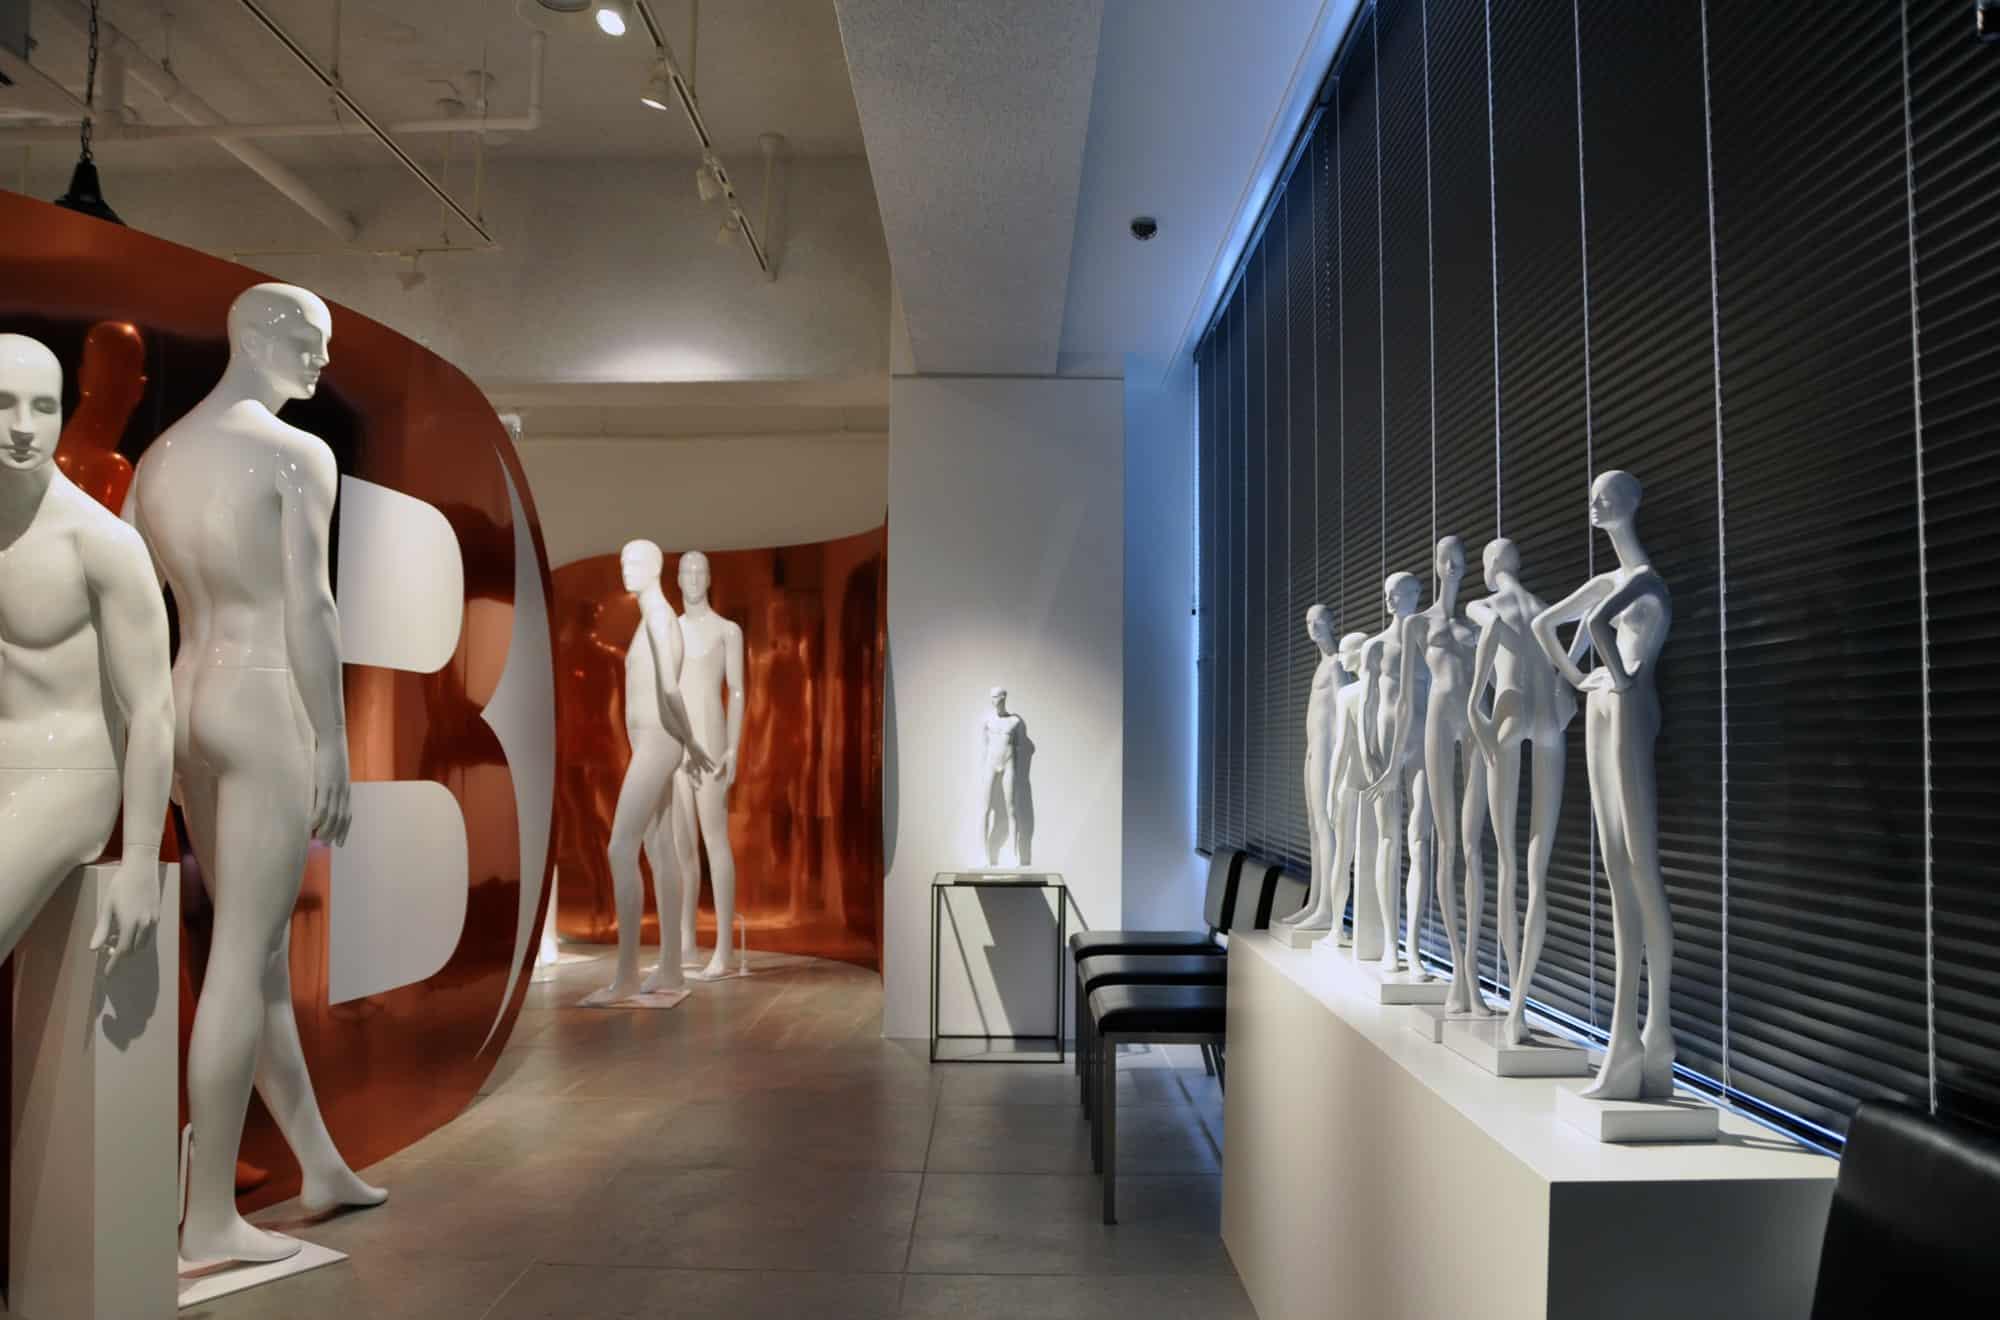 bonaveri mannequin exhibition tokyo japan 11